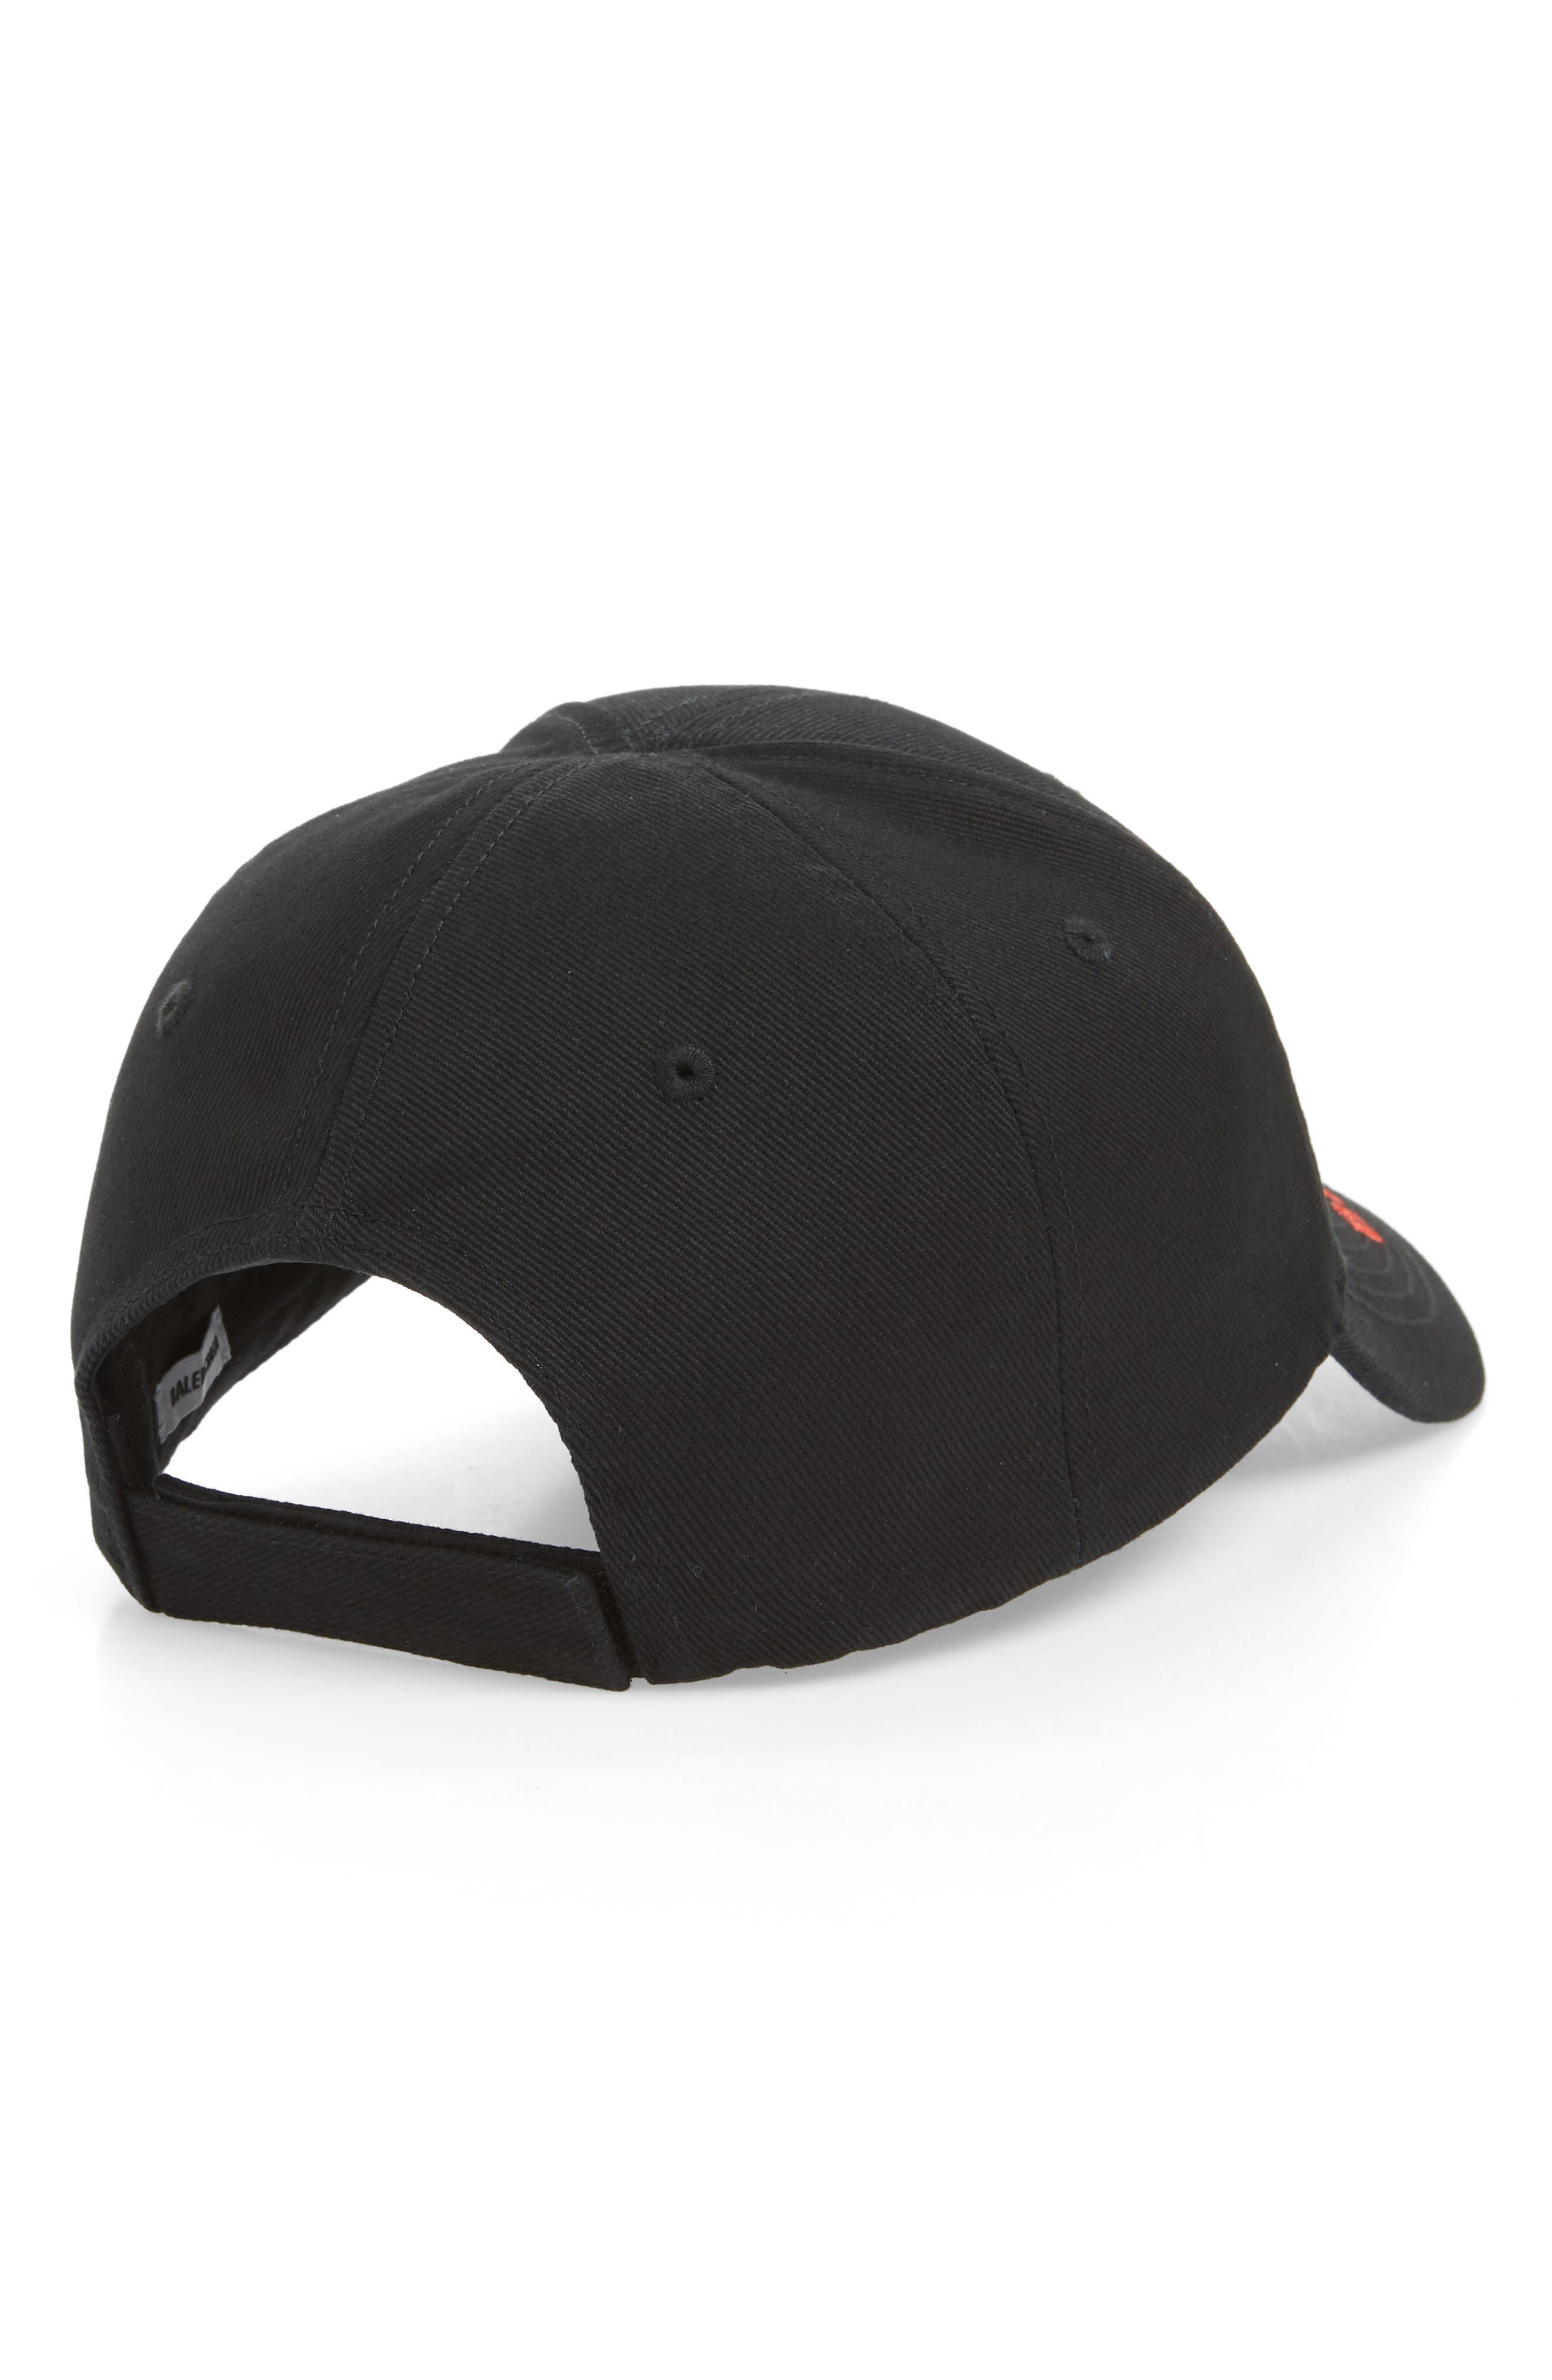 BALENCIAGA, Rainbow Logo Baseball Cap, Alternate thumbnail 2, color, 1000-BLACK